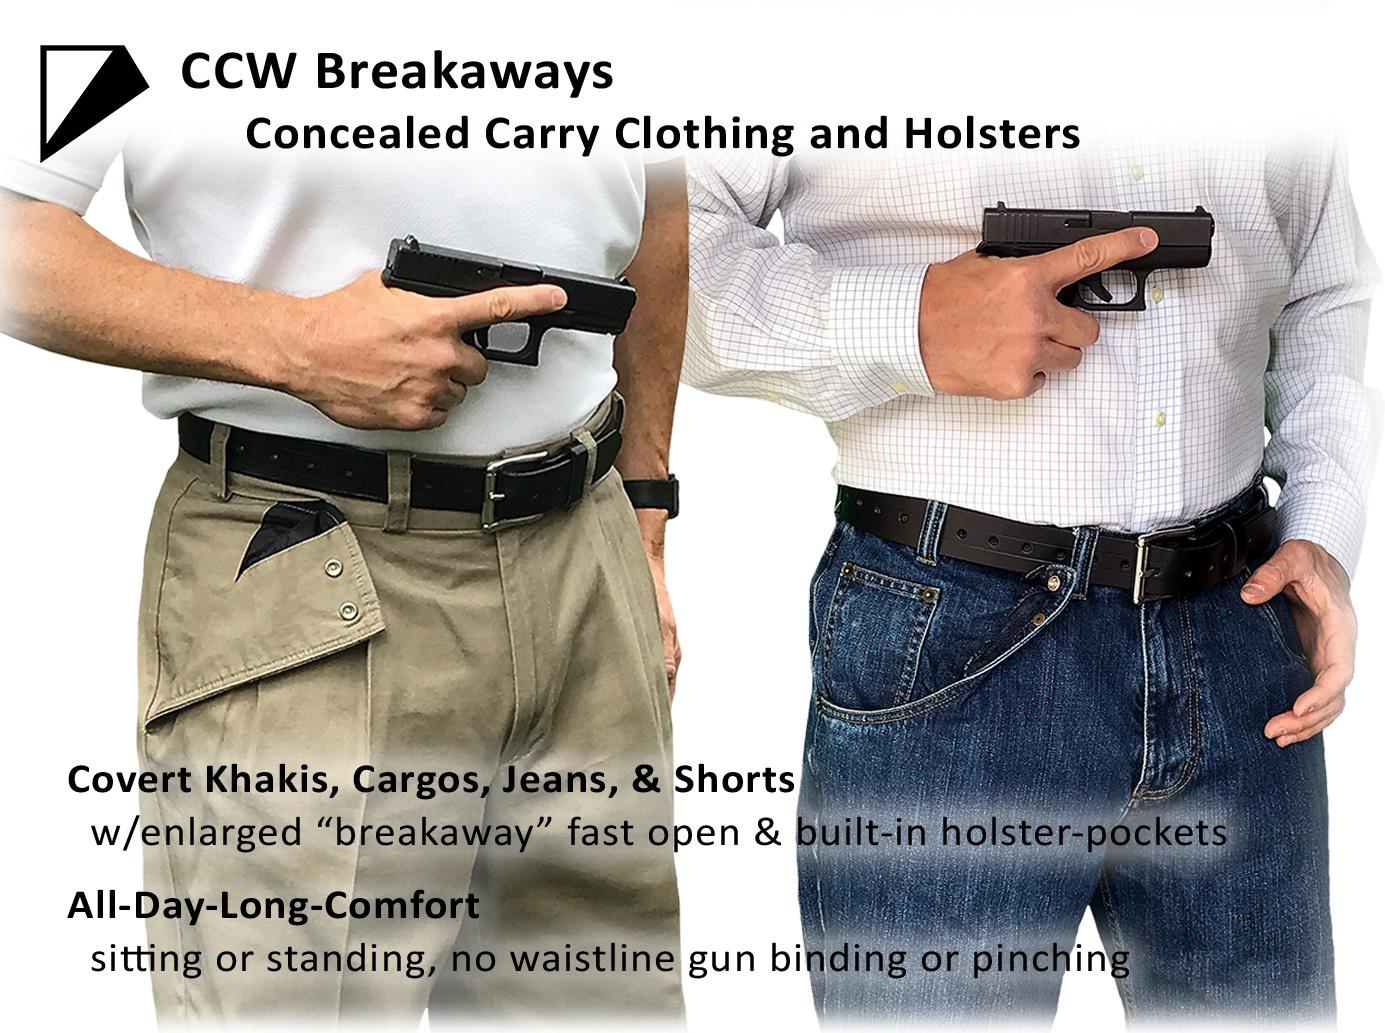 ccw-breakaways-fmg-print-ad-1385x1033.jpg